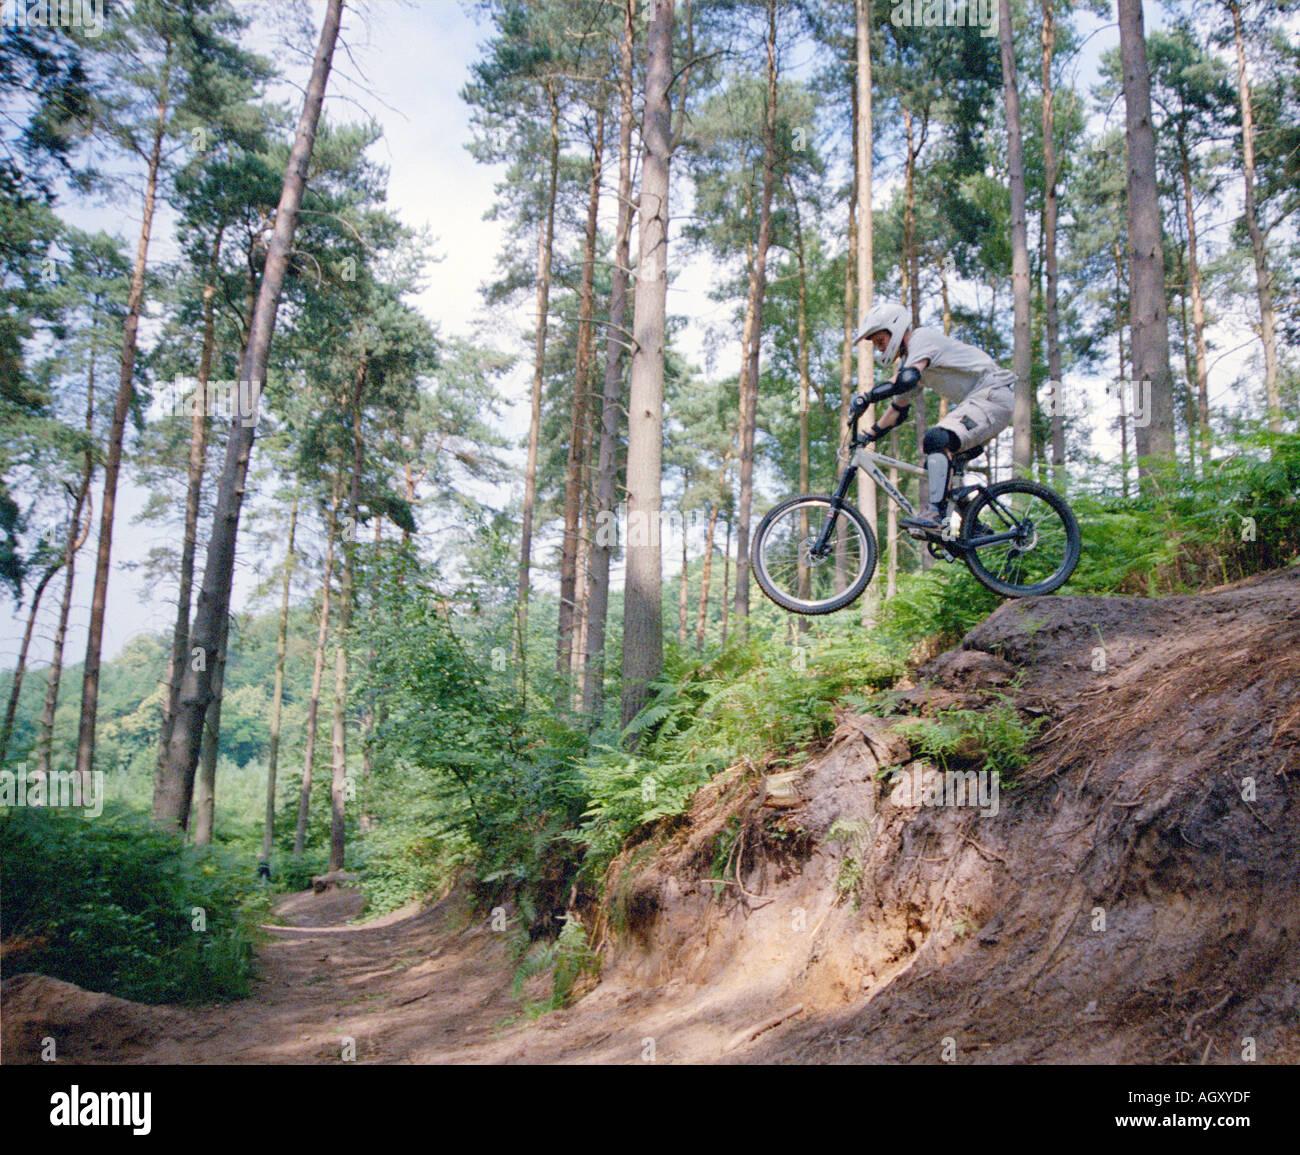 PICTURE CREDIT DOUG BLANE Mountain Biking at the bike park Brickhill Woods Wobrn Sands near Milton Keynes MK Stock Photo